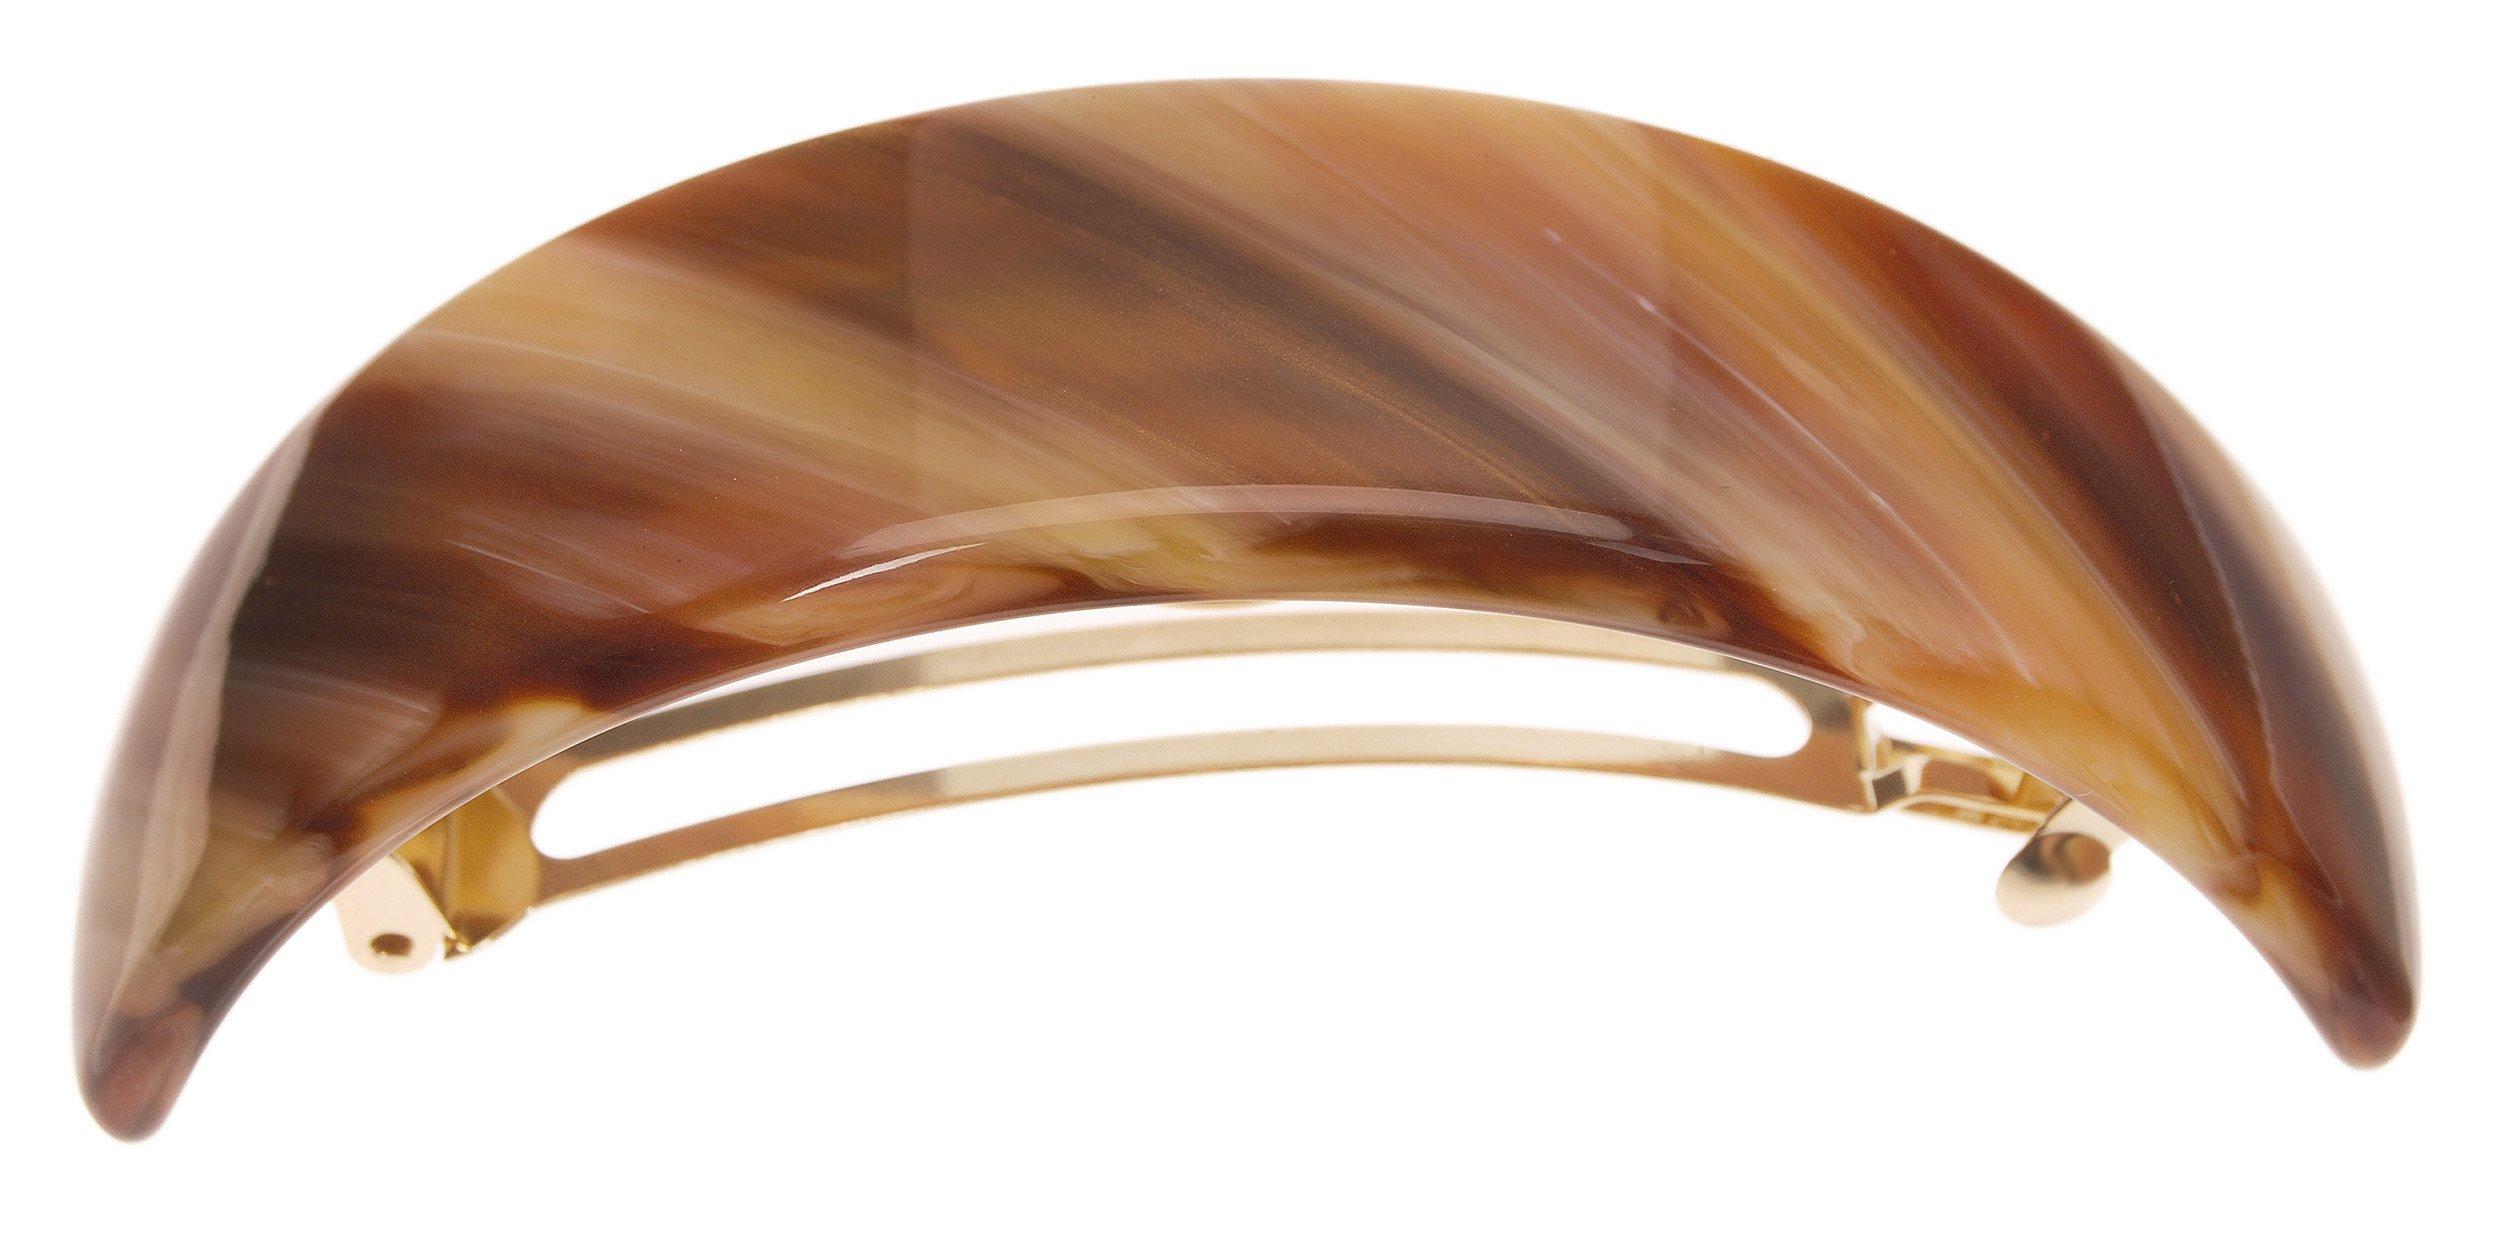 France Luxe Extra Volume Barrette - Caramel Horn